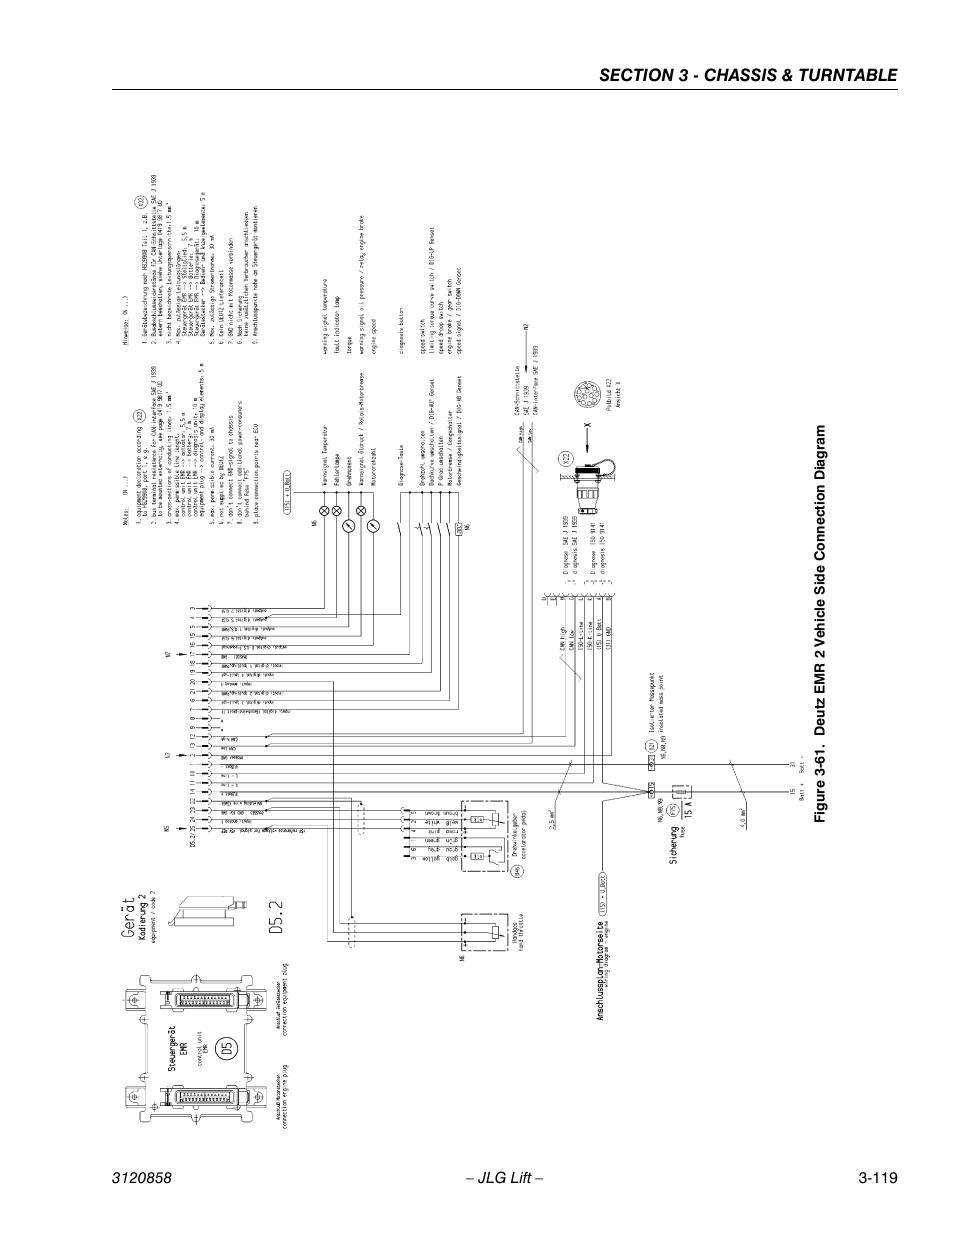 deutz emr 2 vehicle side connection diagram 119 jlg 800a aj rh manualsdir com Deutz Tractors Deutz Repair Manual